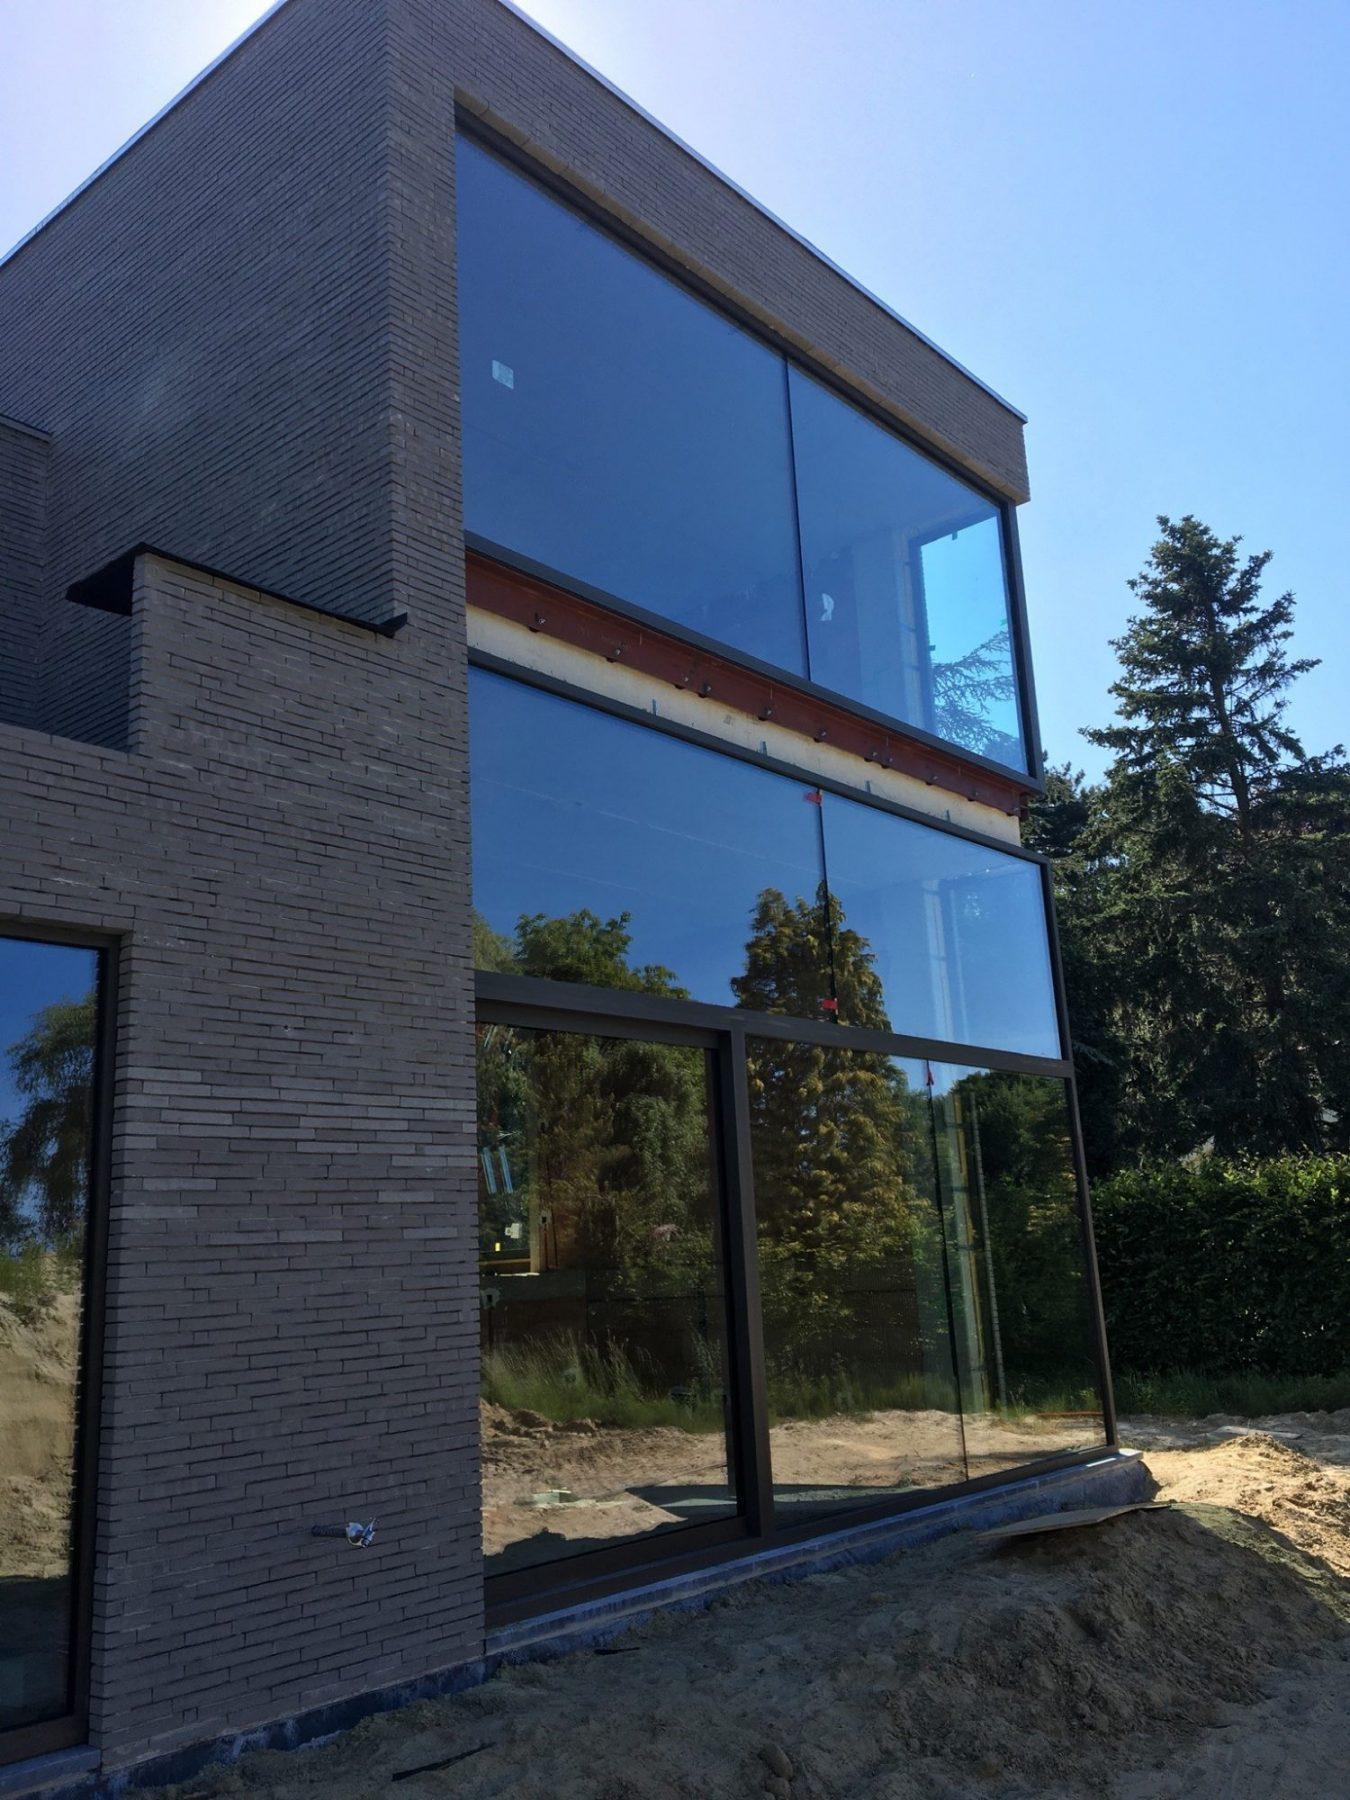 https://allglas.be/wp-content/uploads/2020/09/nieuwbouwwoning-muizen-isolatieglas-glaskraanwerk-01-scaled.jpg